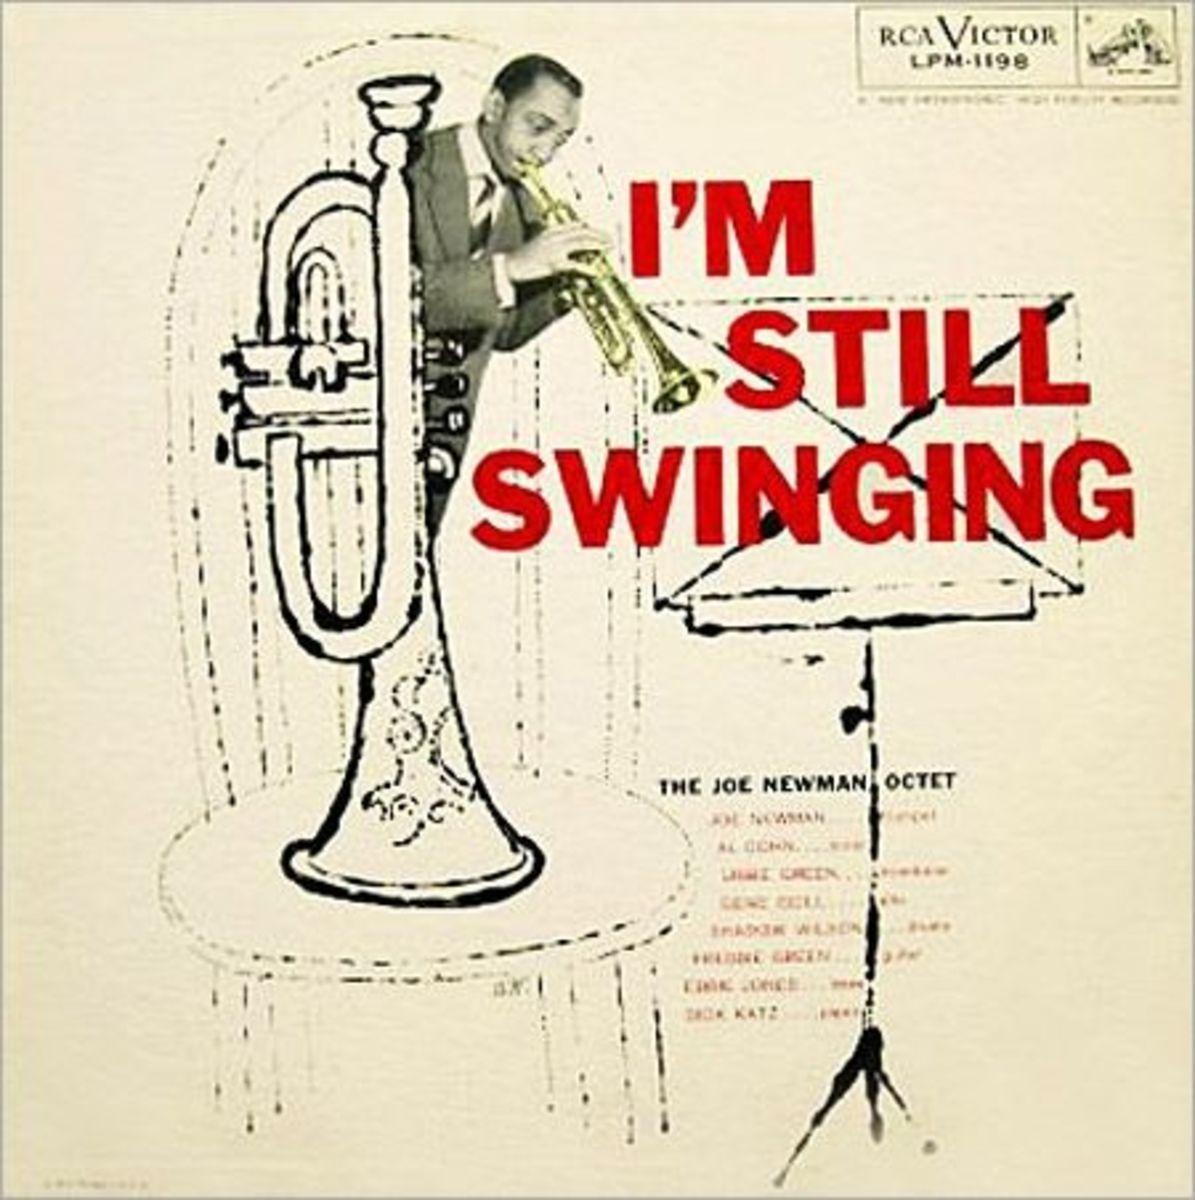 "Joe Newman ""I´m Still Swinging"" RCA Victor 1198 12"" LP Vinyl Record, Album Cover Art and Design by Andy Warhol"